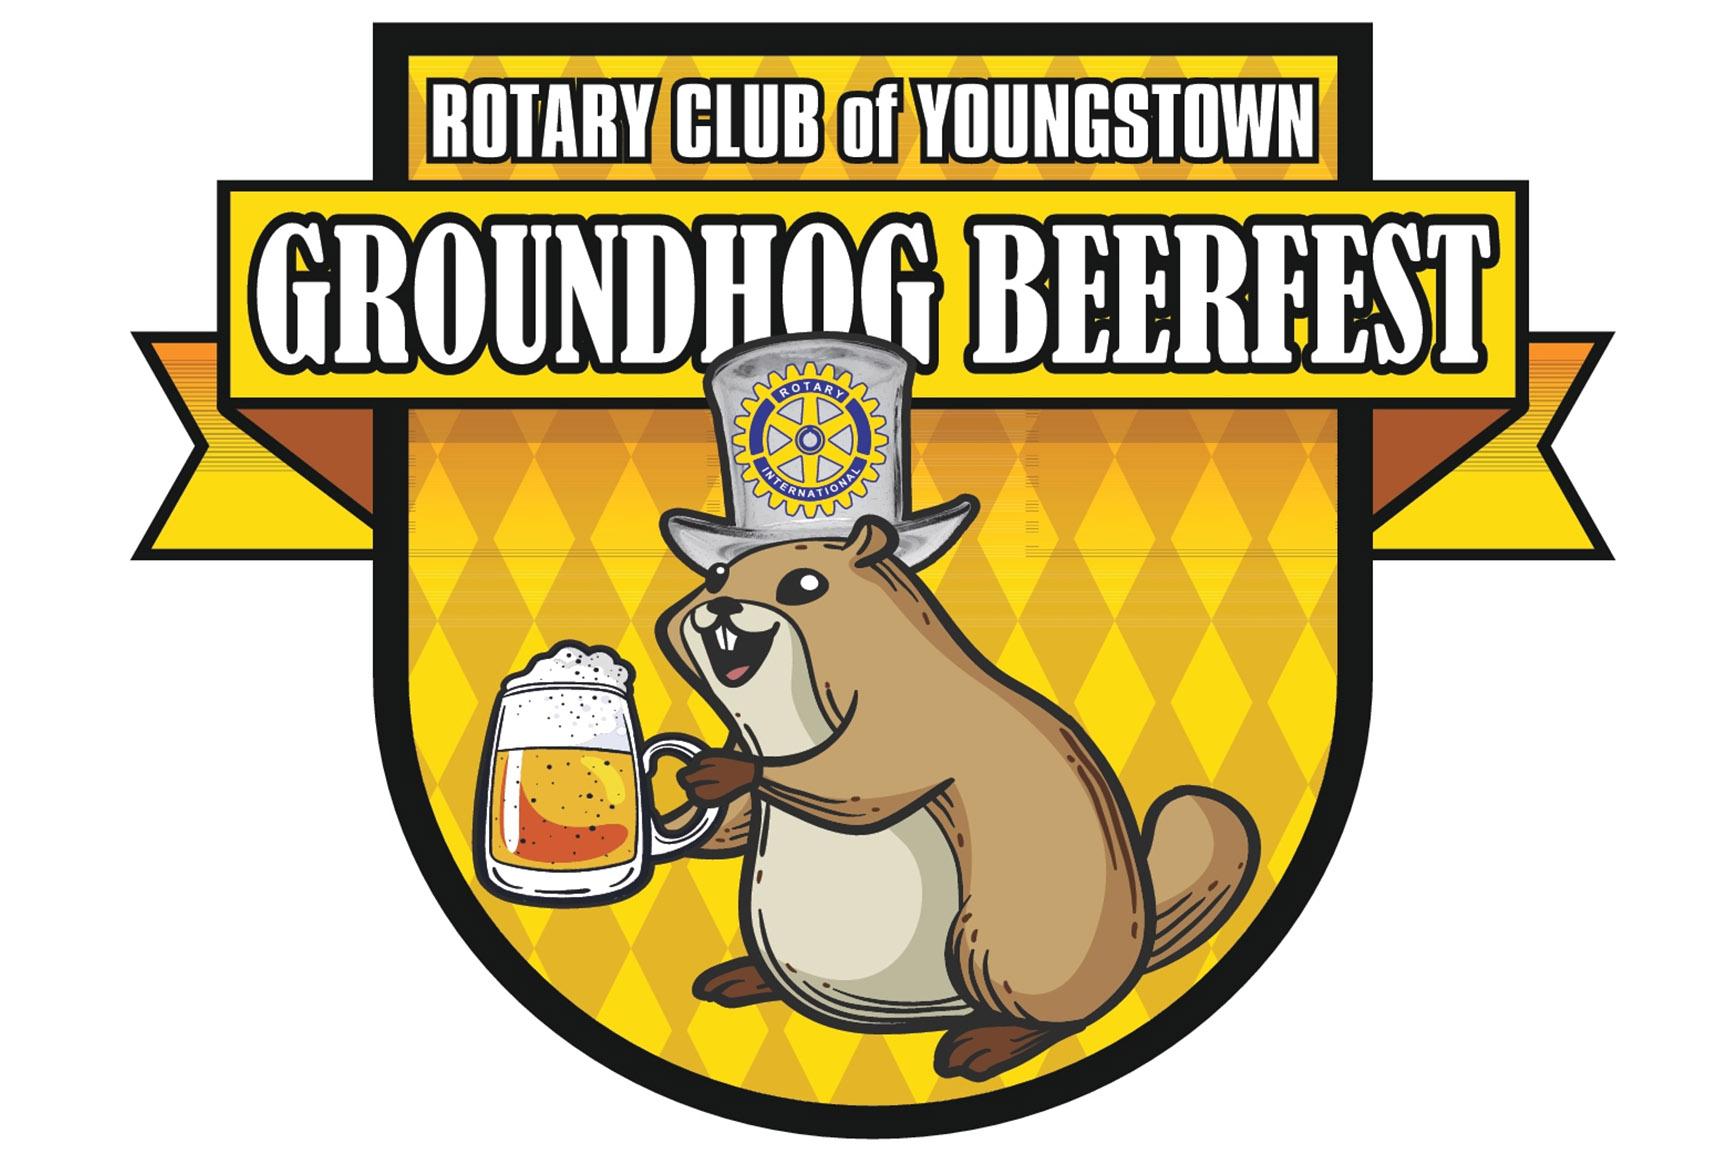 Groundhog-Beerfest